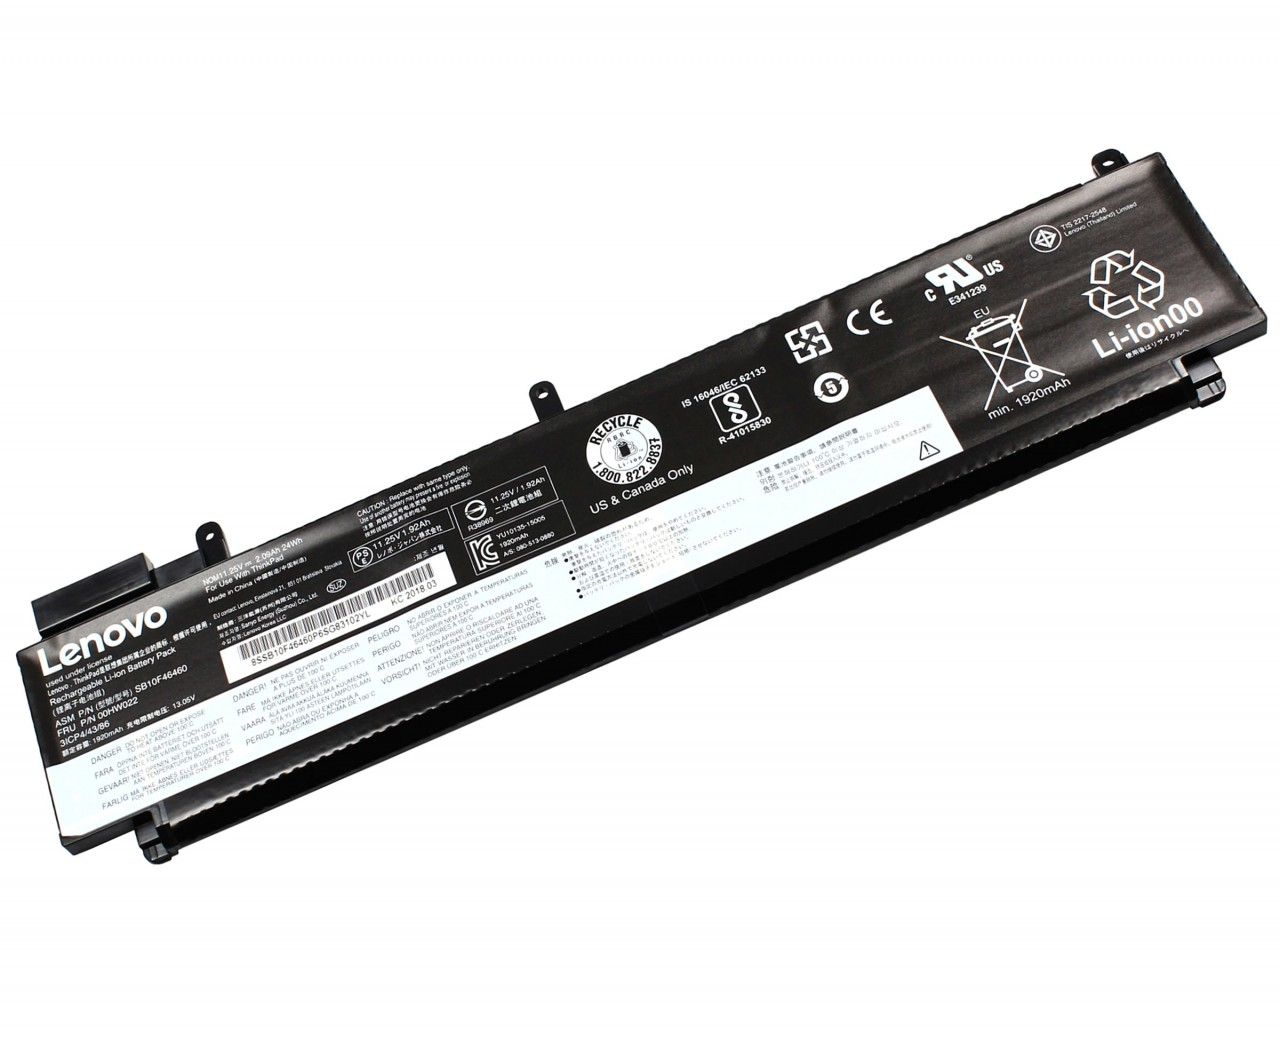 Baterie Lenovo ThinkPad T460S Originala 24Wh imagine powerlaptop.ro 2021